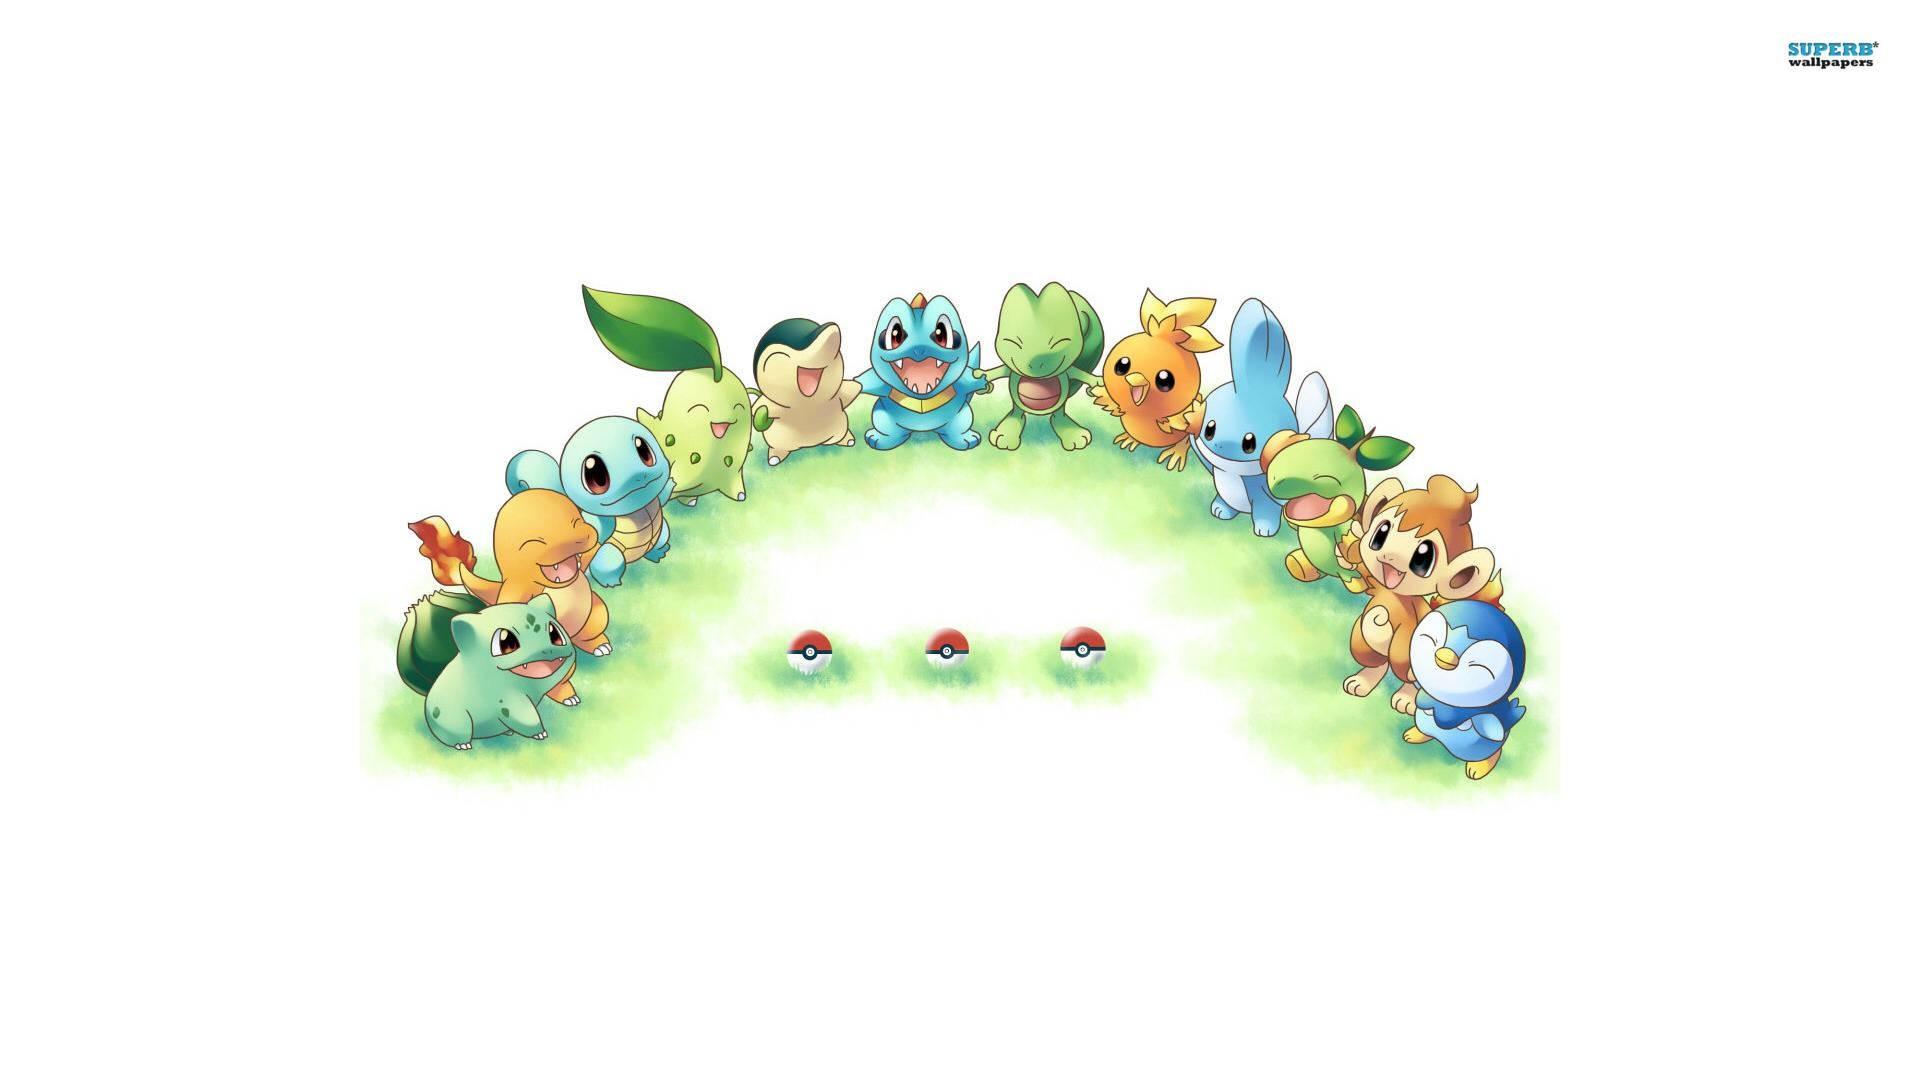 Pokemon Wallpapers Cute – Wallpaper Cave